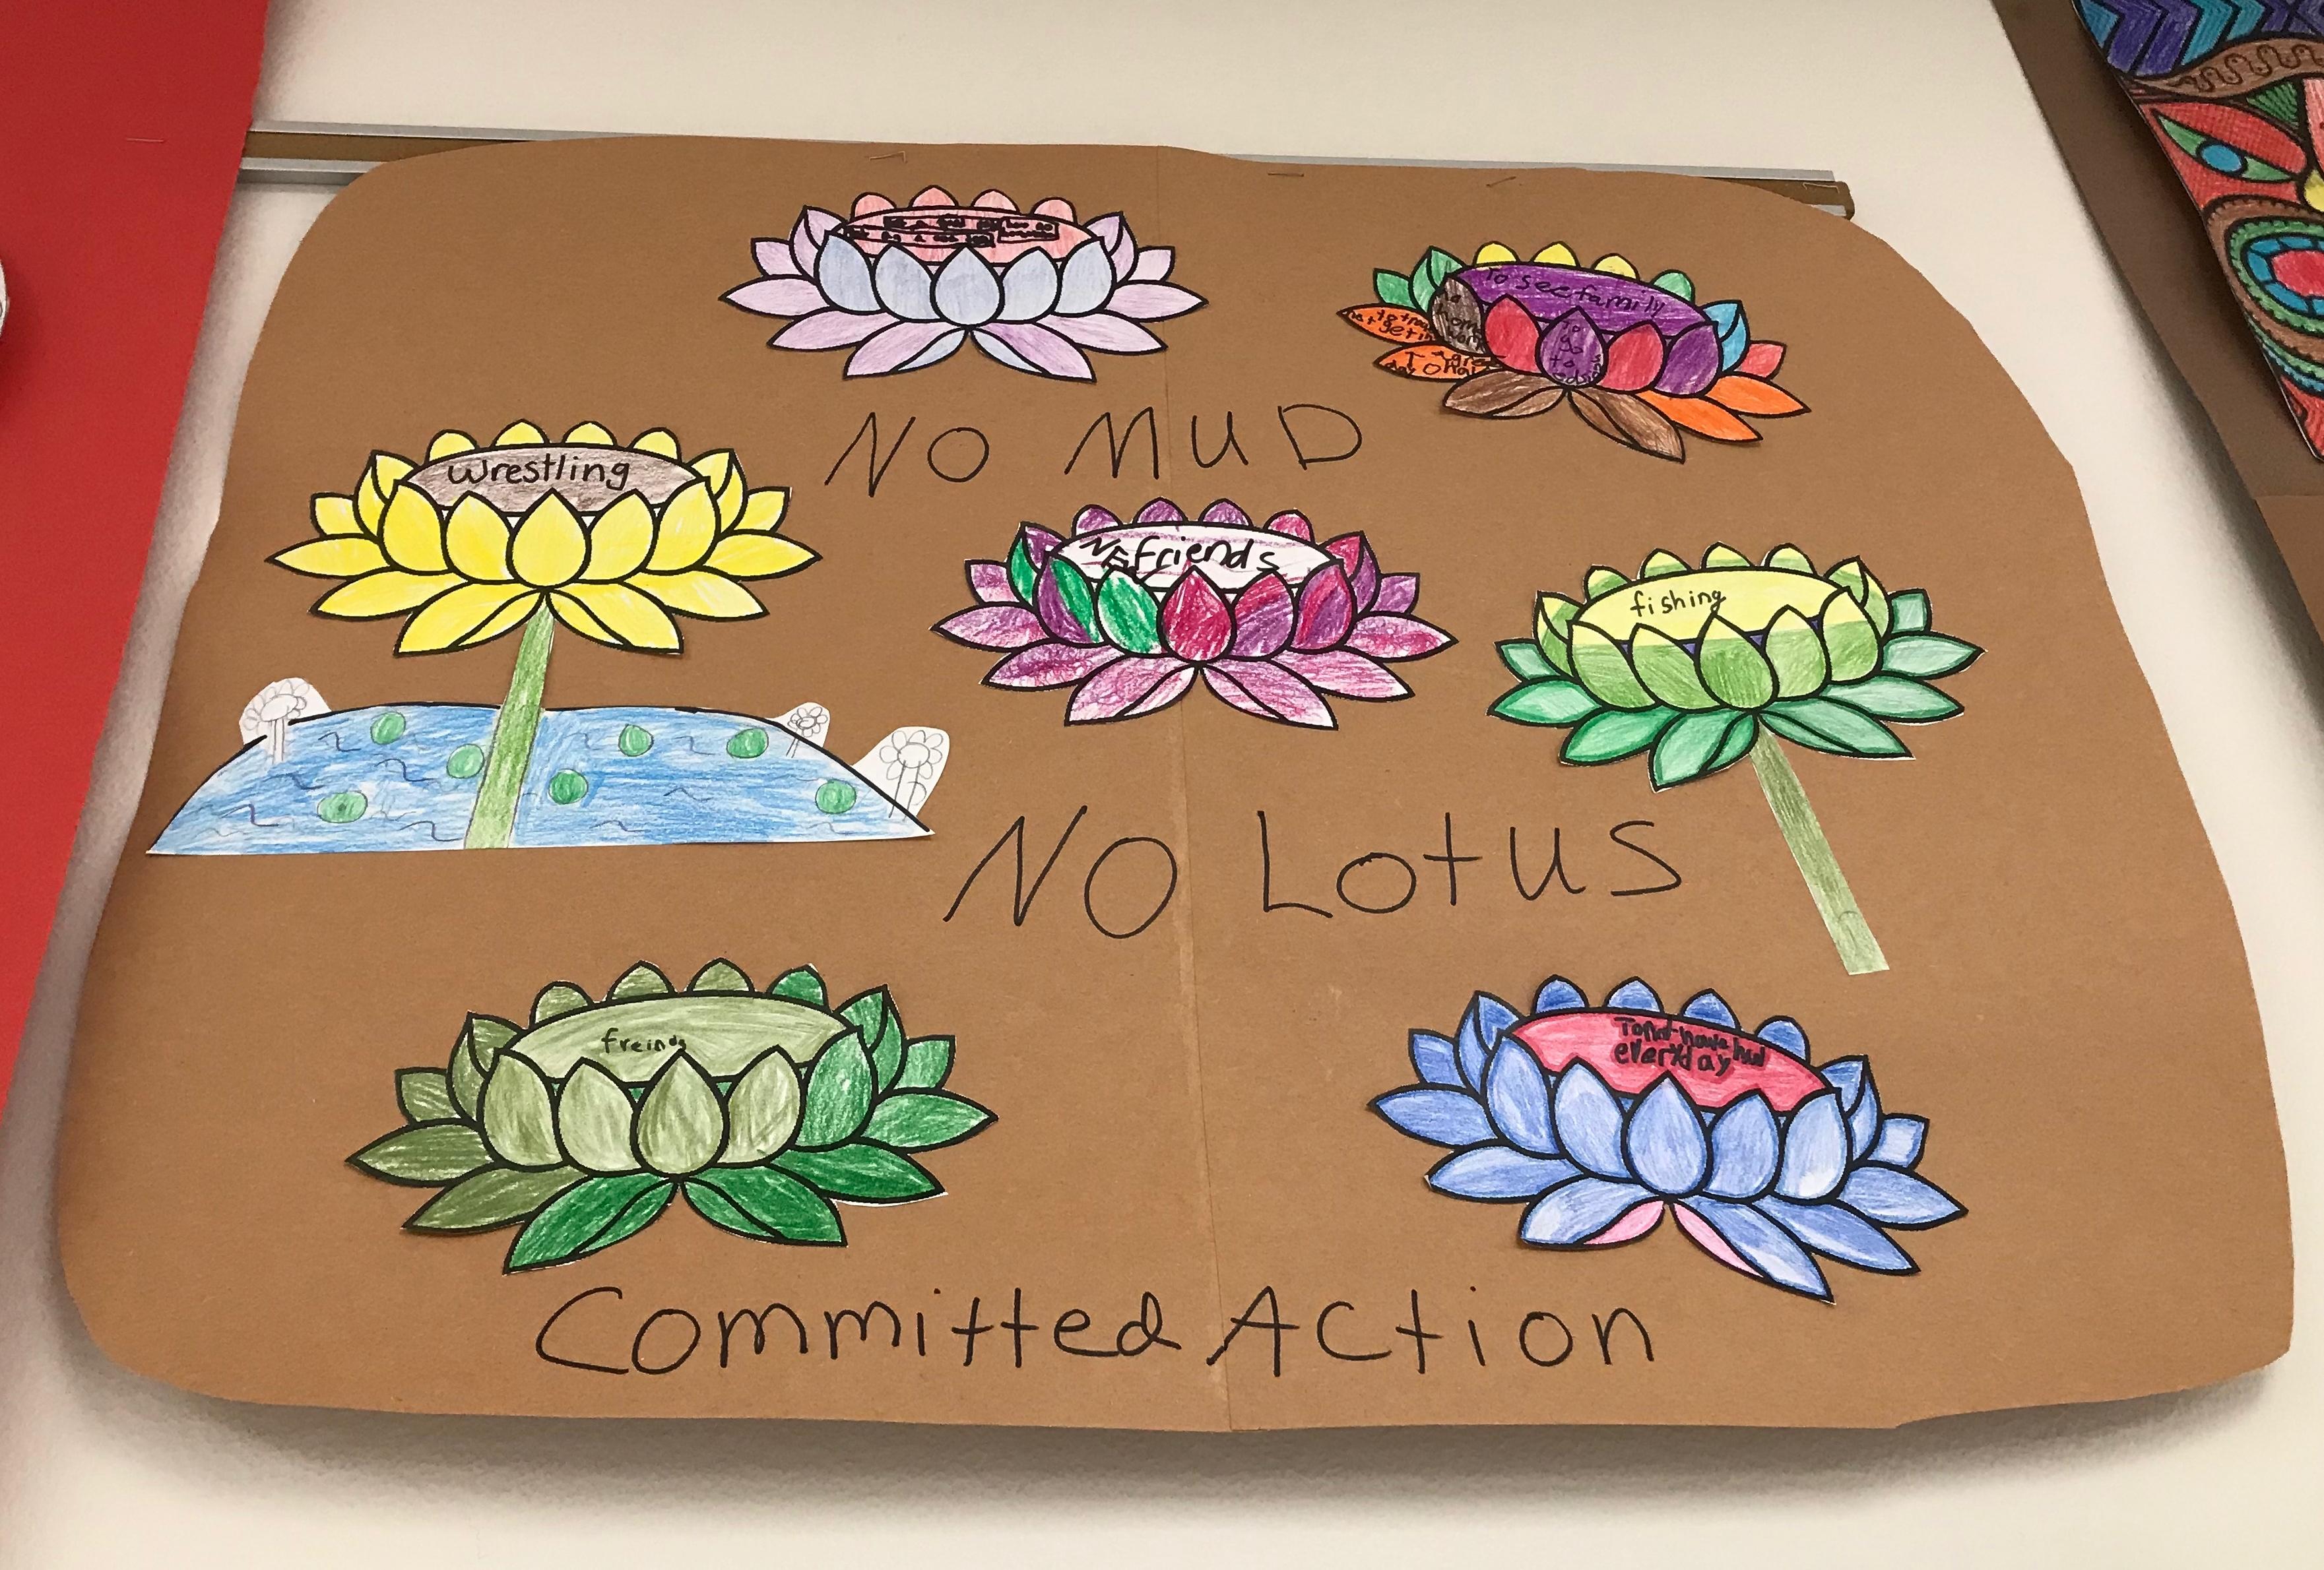 Day 19: No Mud, No Lotus